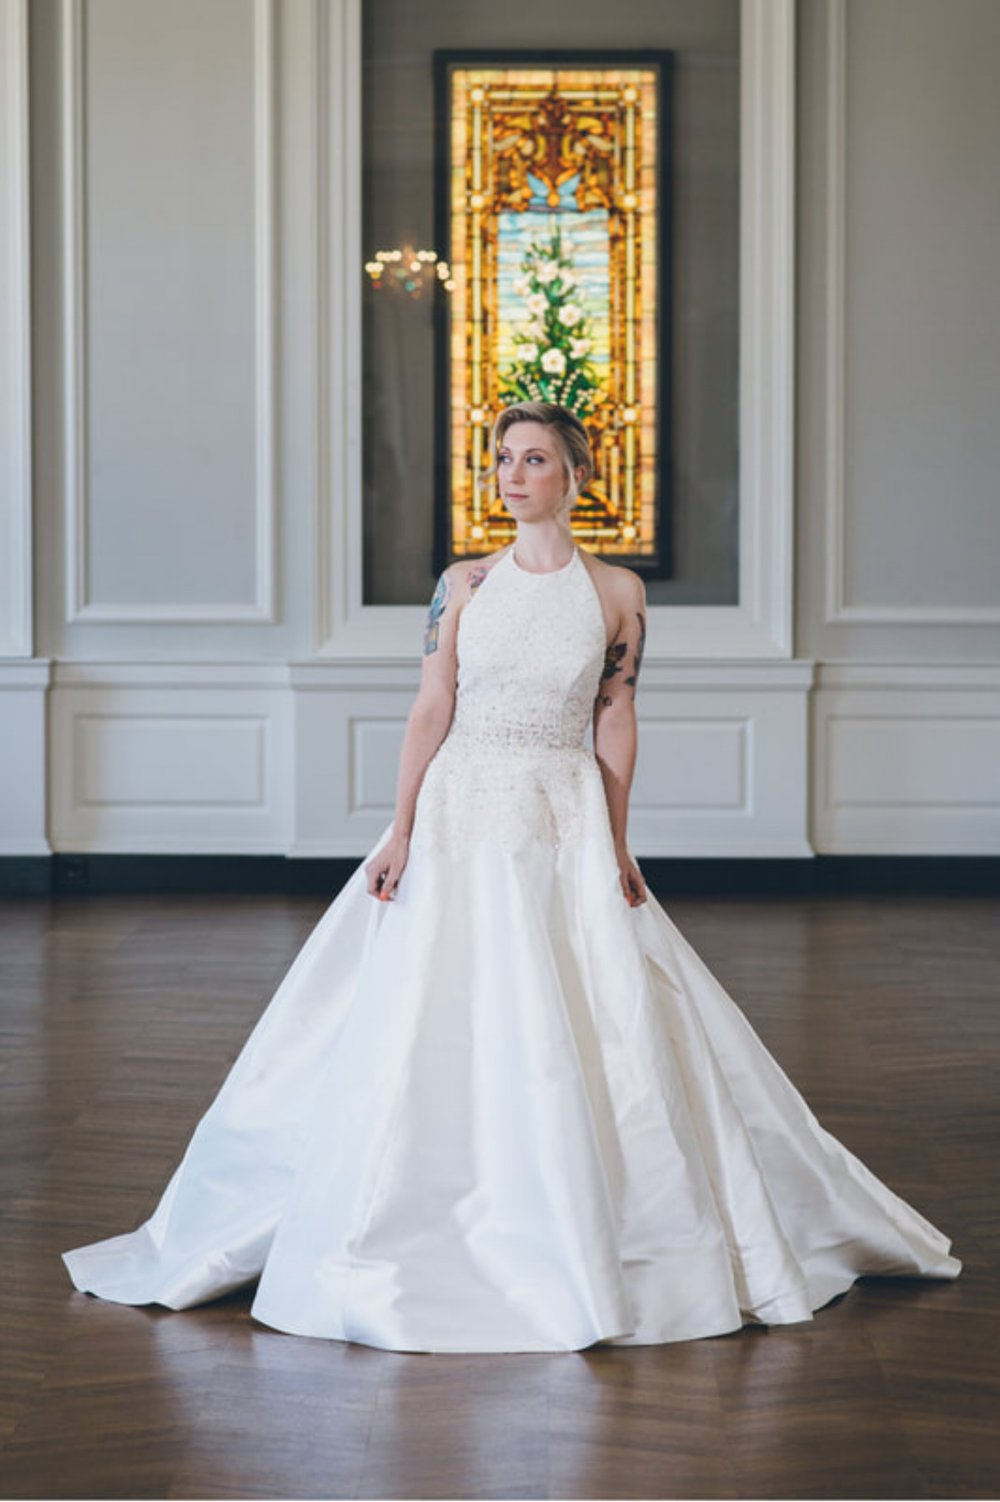 edith-elan-karli-2018-american-bridal-designer-19_1_orig.jpg